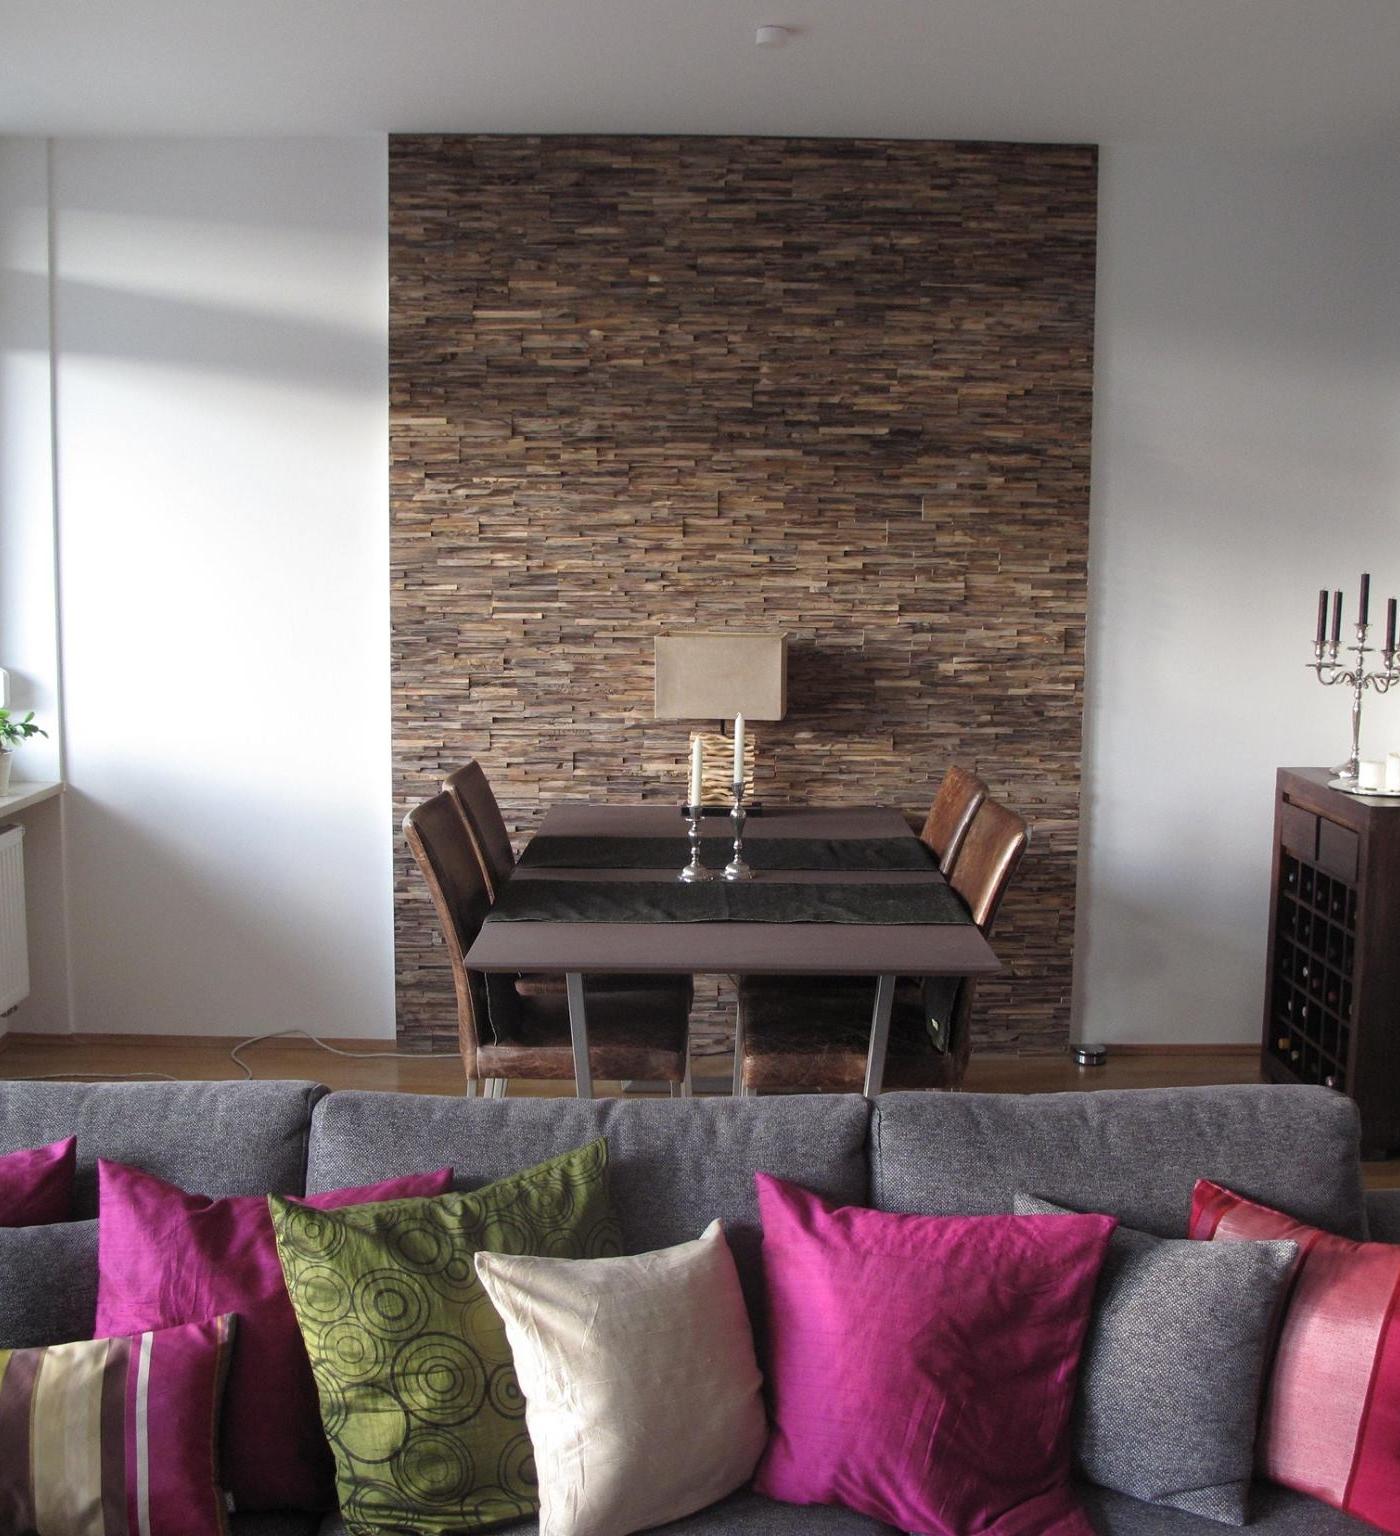 Holz Wandverkleidung Teak modern schlicht  BS-Holzdesign